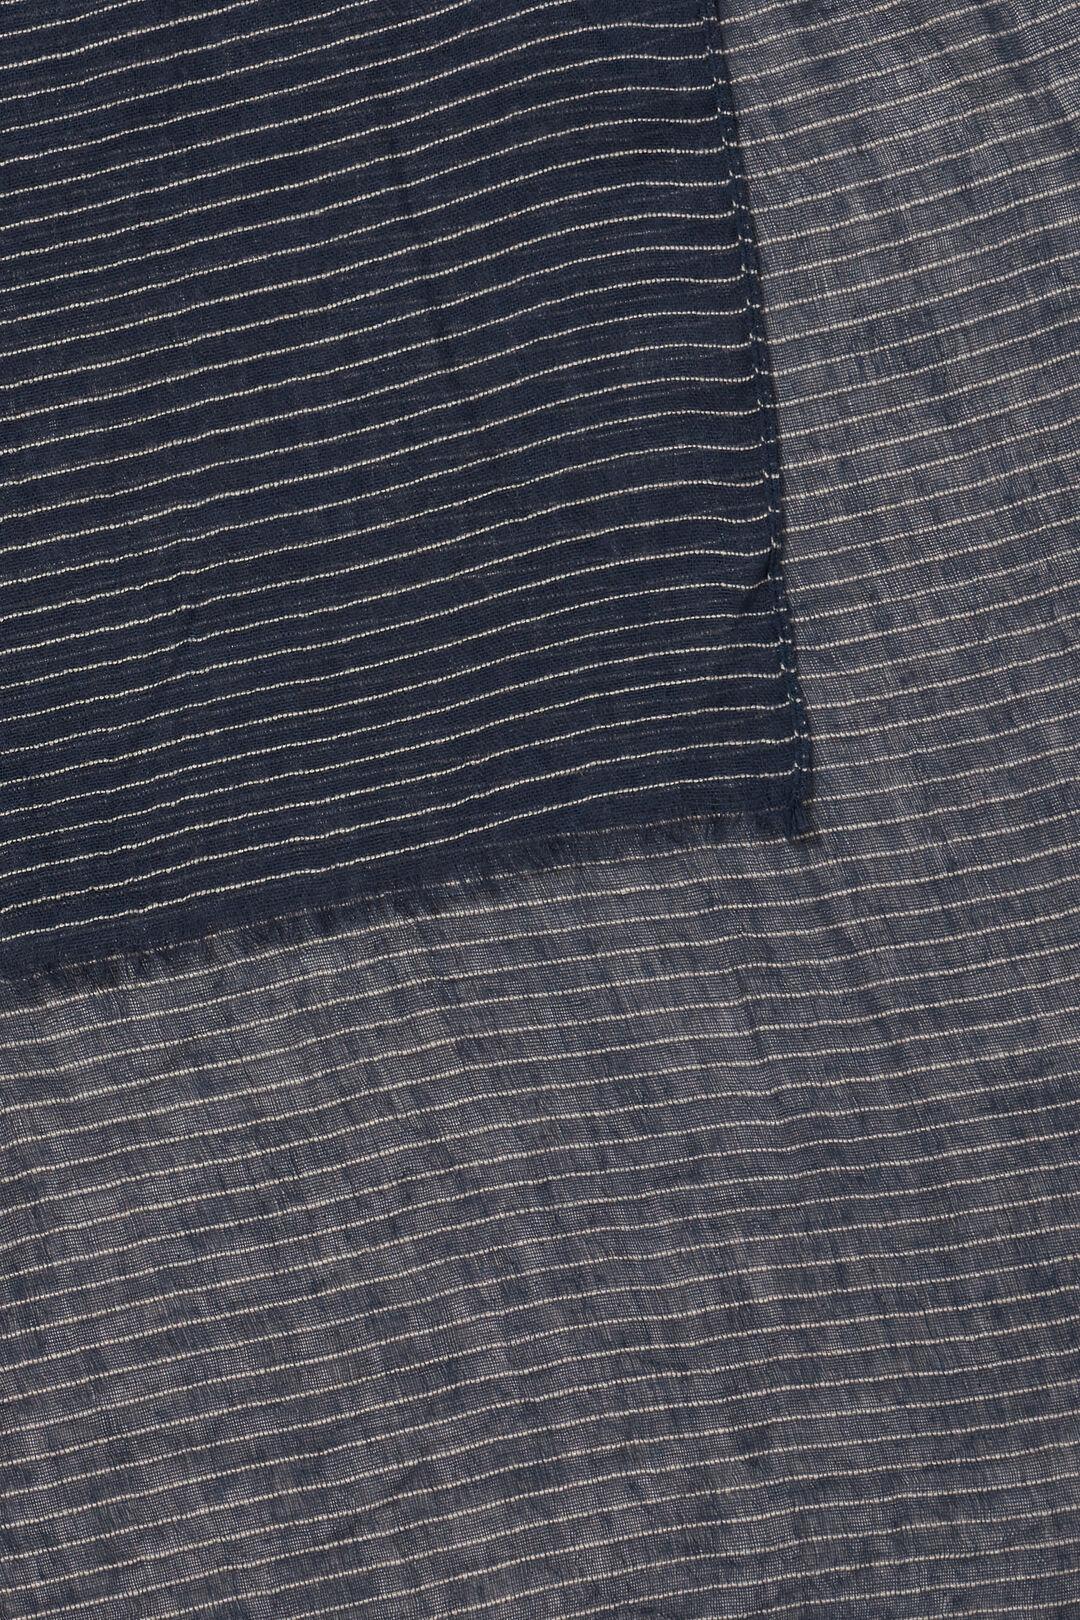 Textured Striped Scarf  NAVY NEUTRAL BLUSH  hi-res